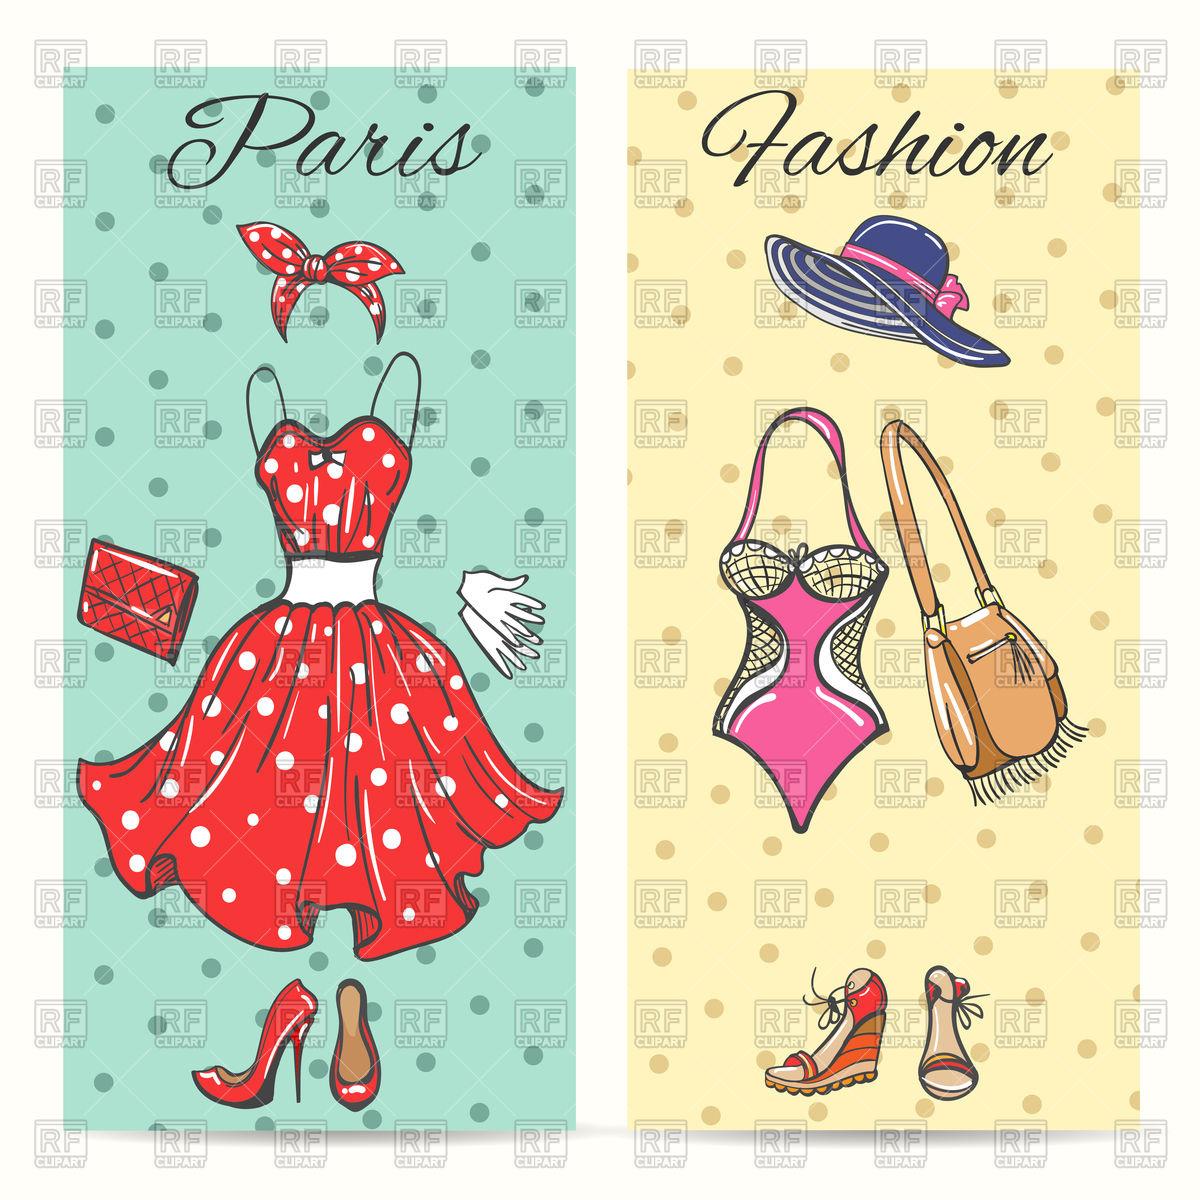 Paris fashion clothes cards for ladies boutique Stock Vector Image.